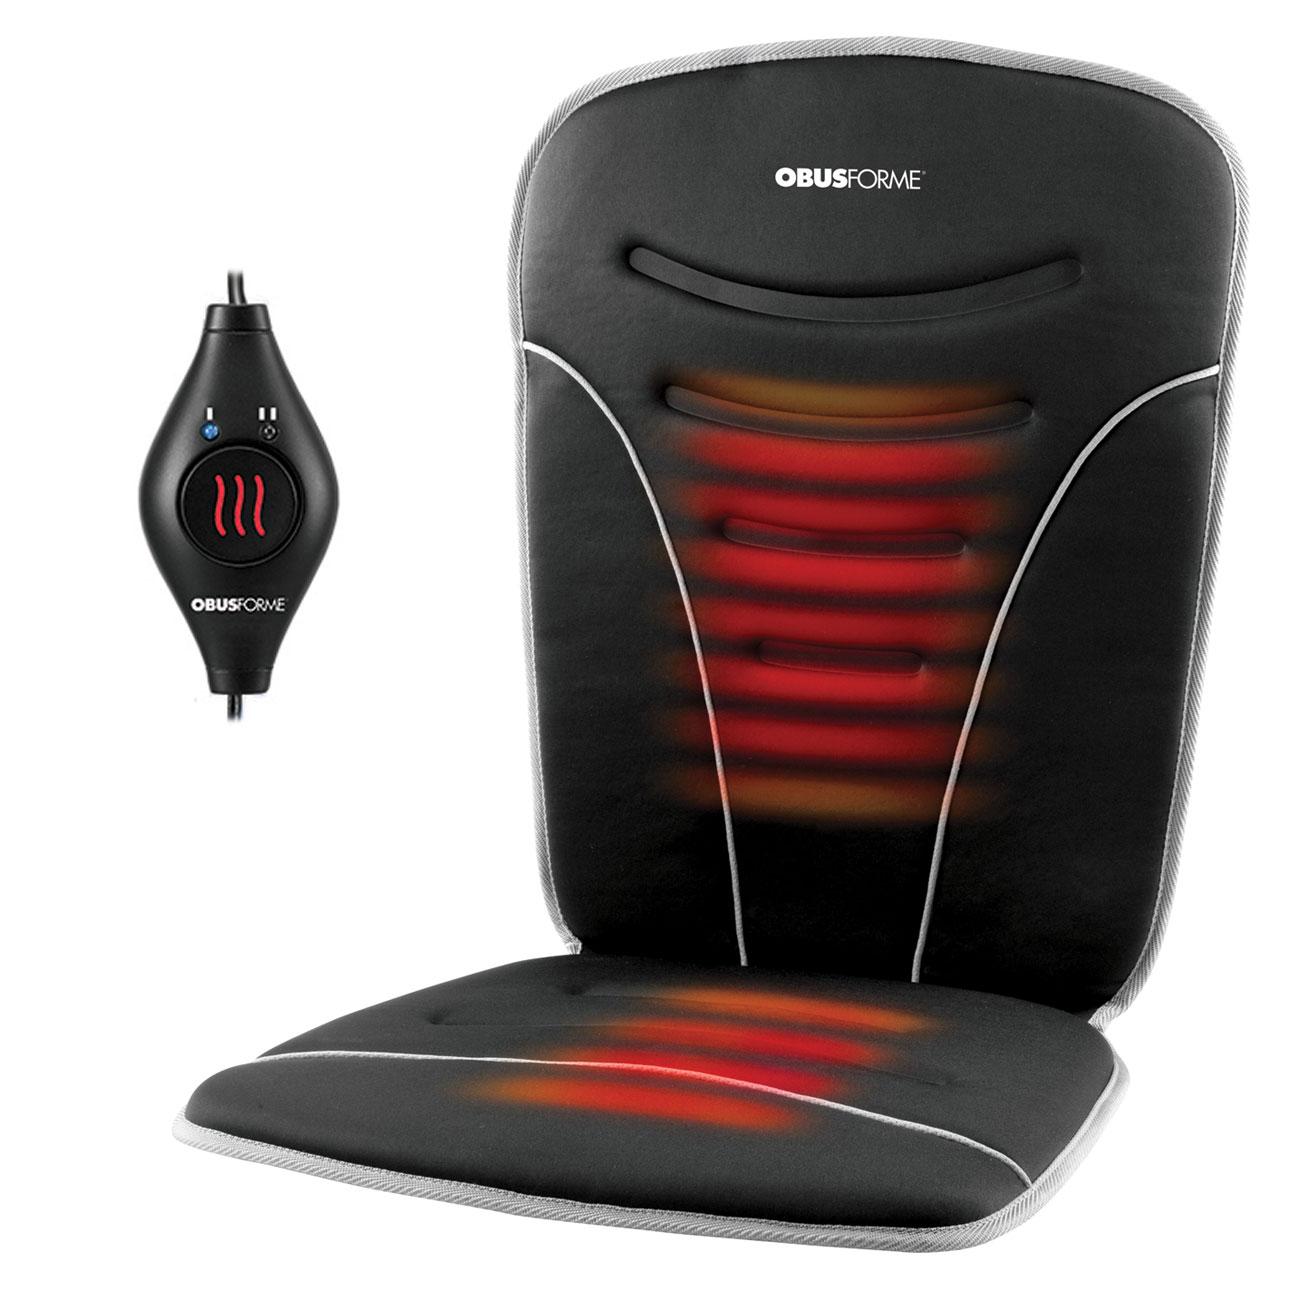 Back and Seat Heated Car Cushion- Black